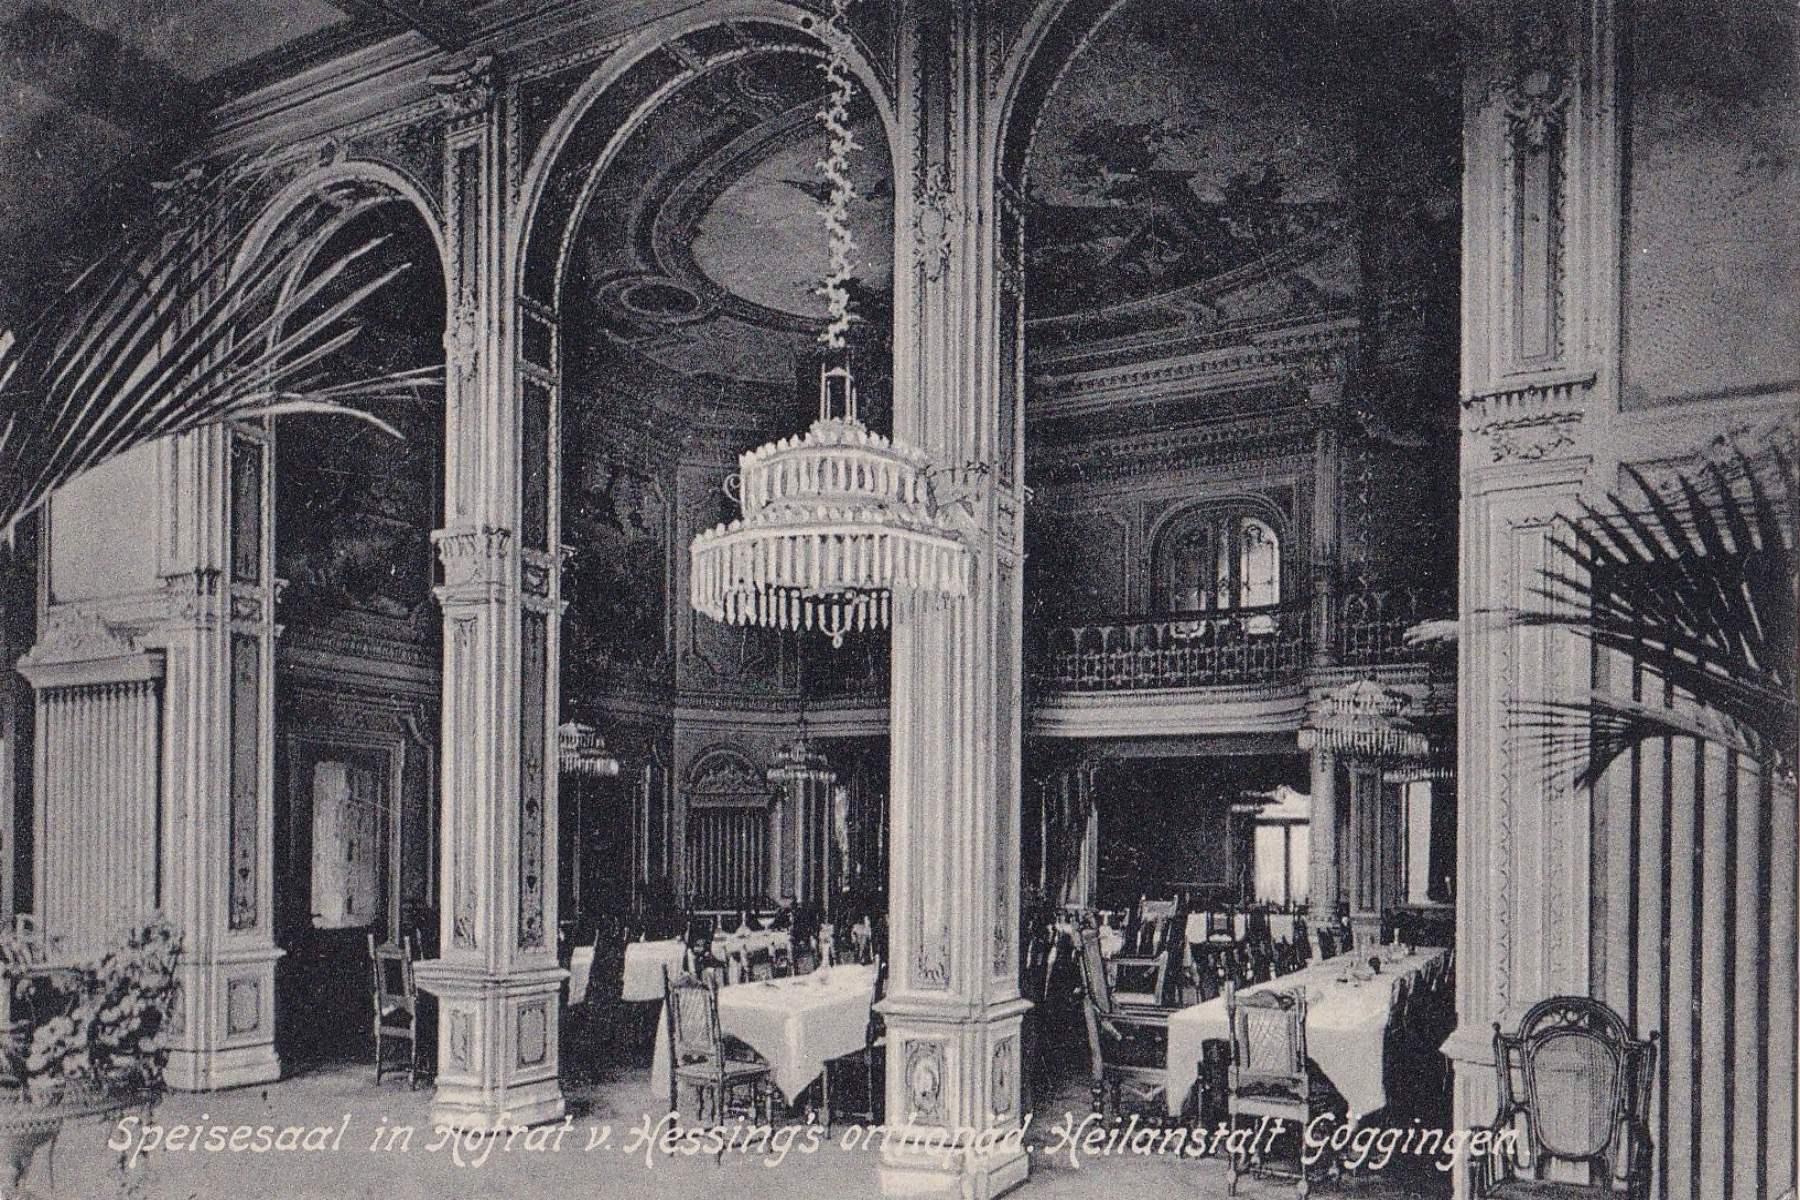 Speisesaal der Hessingklinik um 1900  – ©Privatsammlung Gregor Nagler